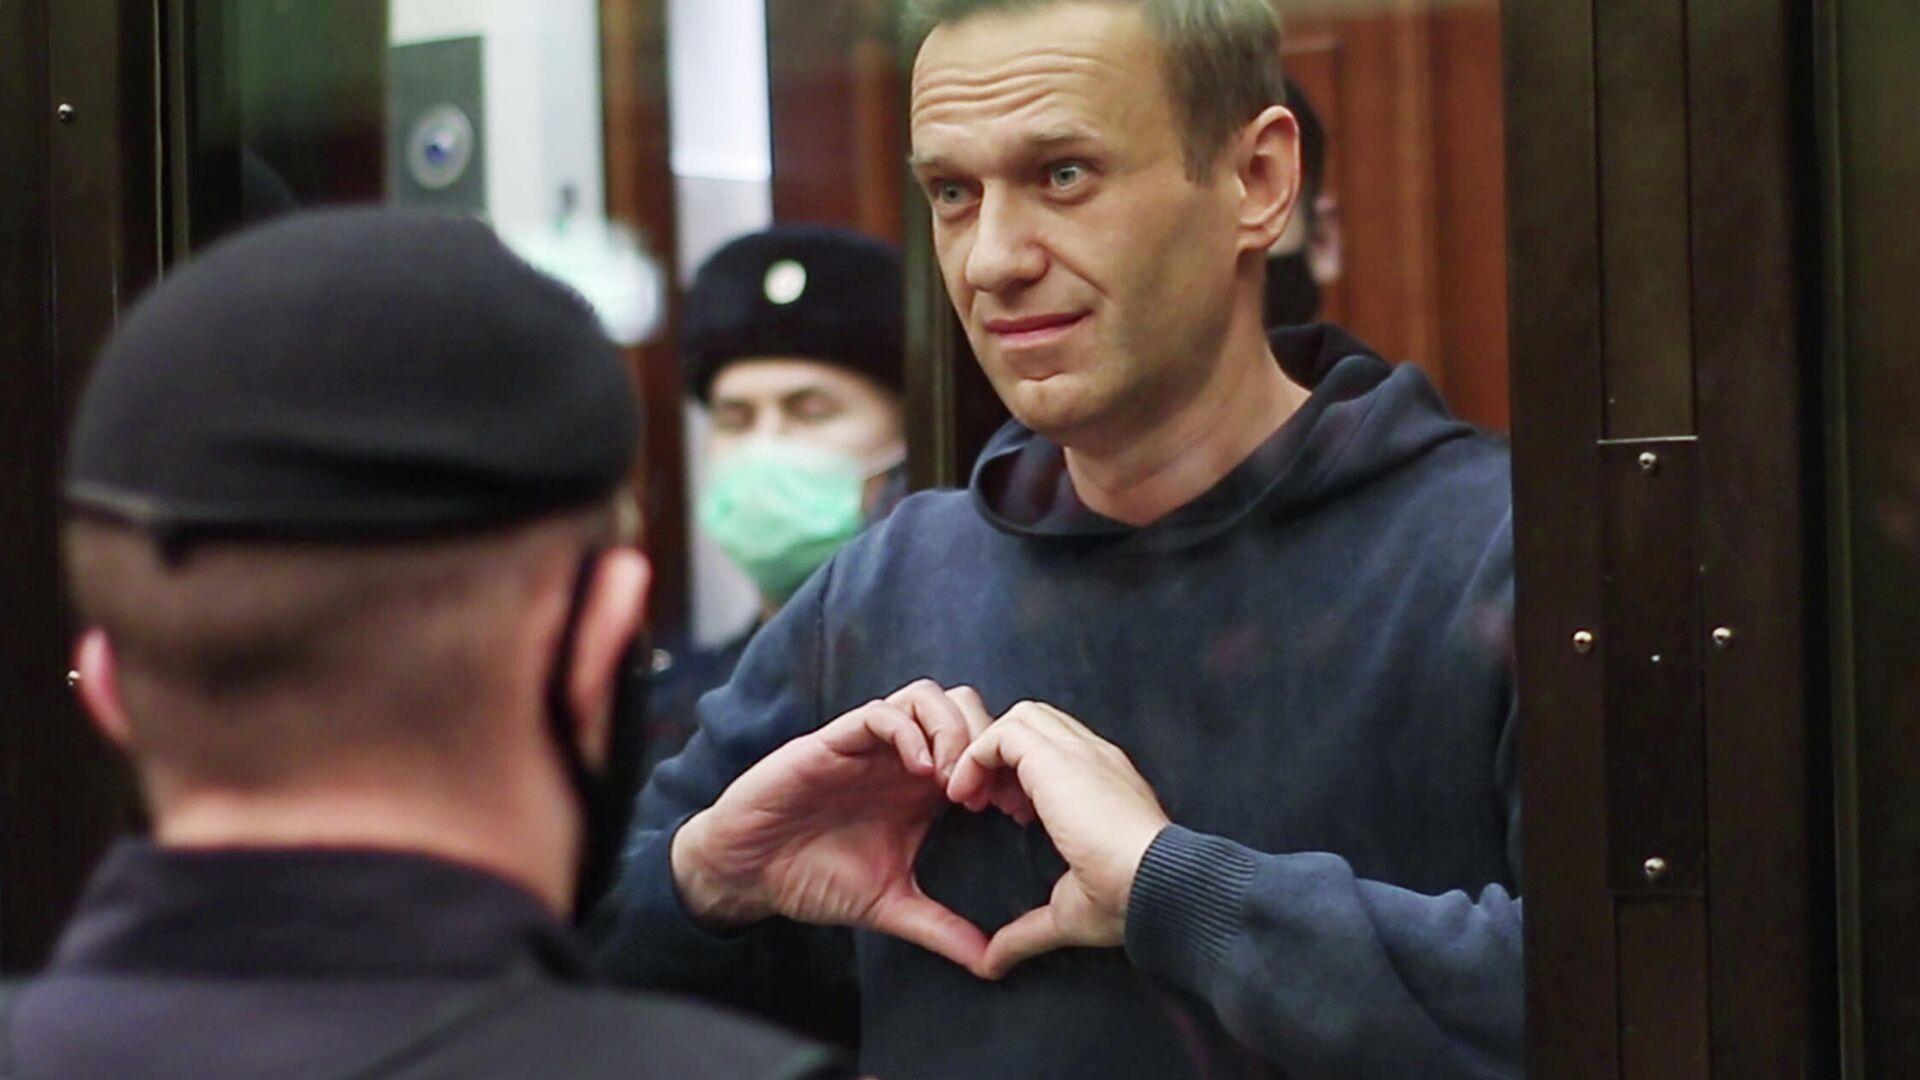 Bloguero opoistor ruso Alexéi Navalni - Sputnik Mundo, 1920, 03.03.2021